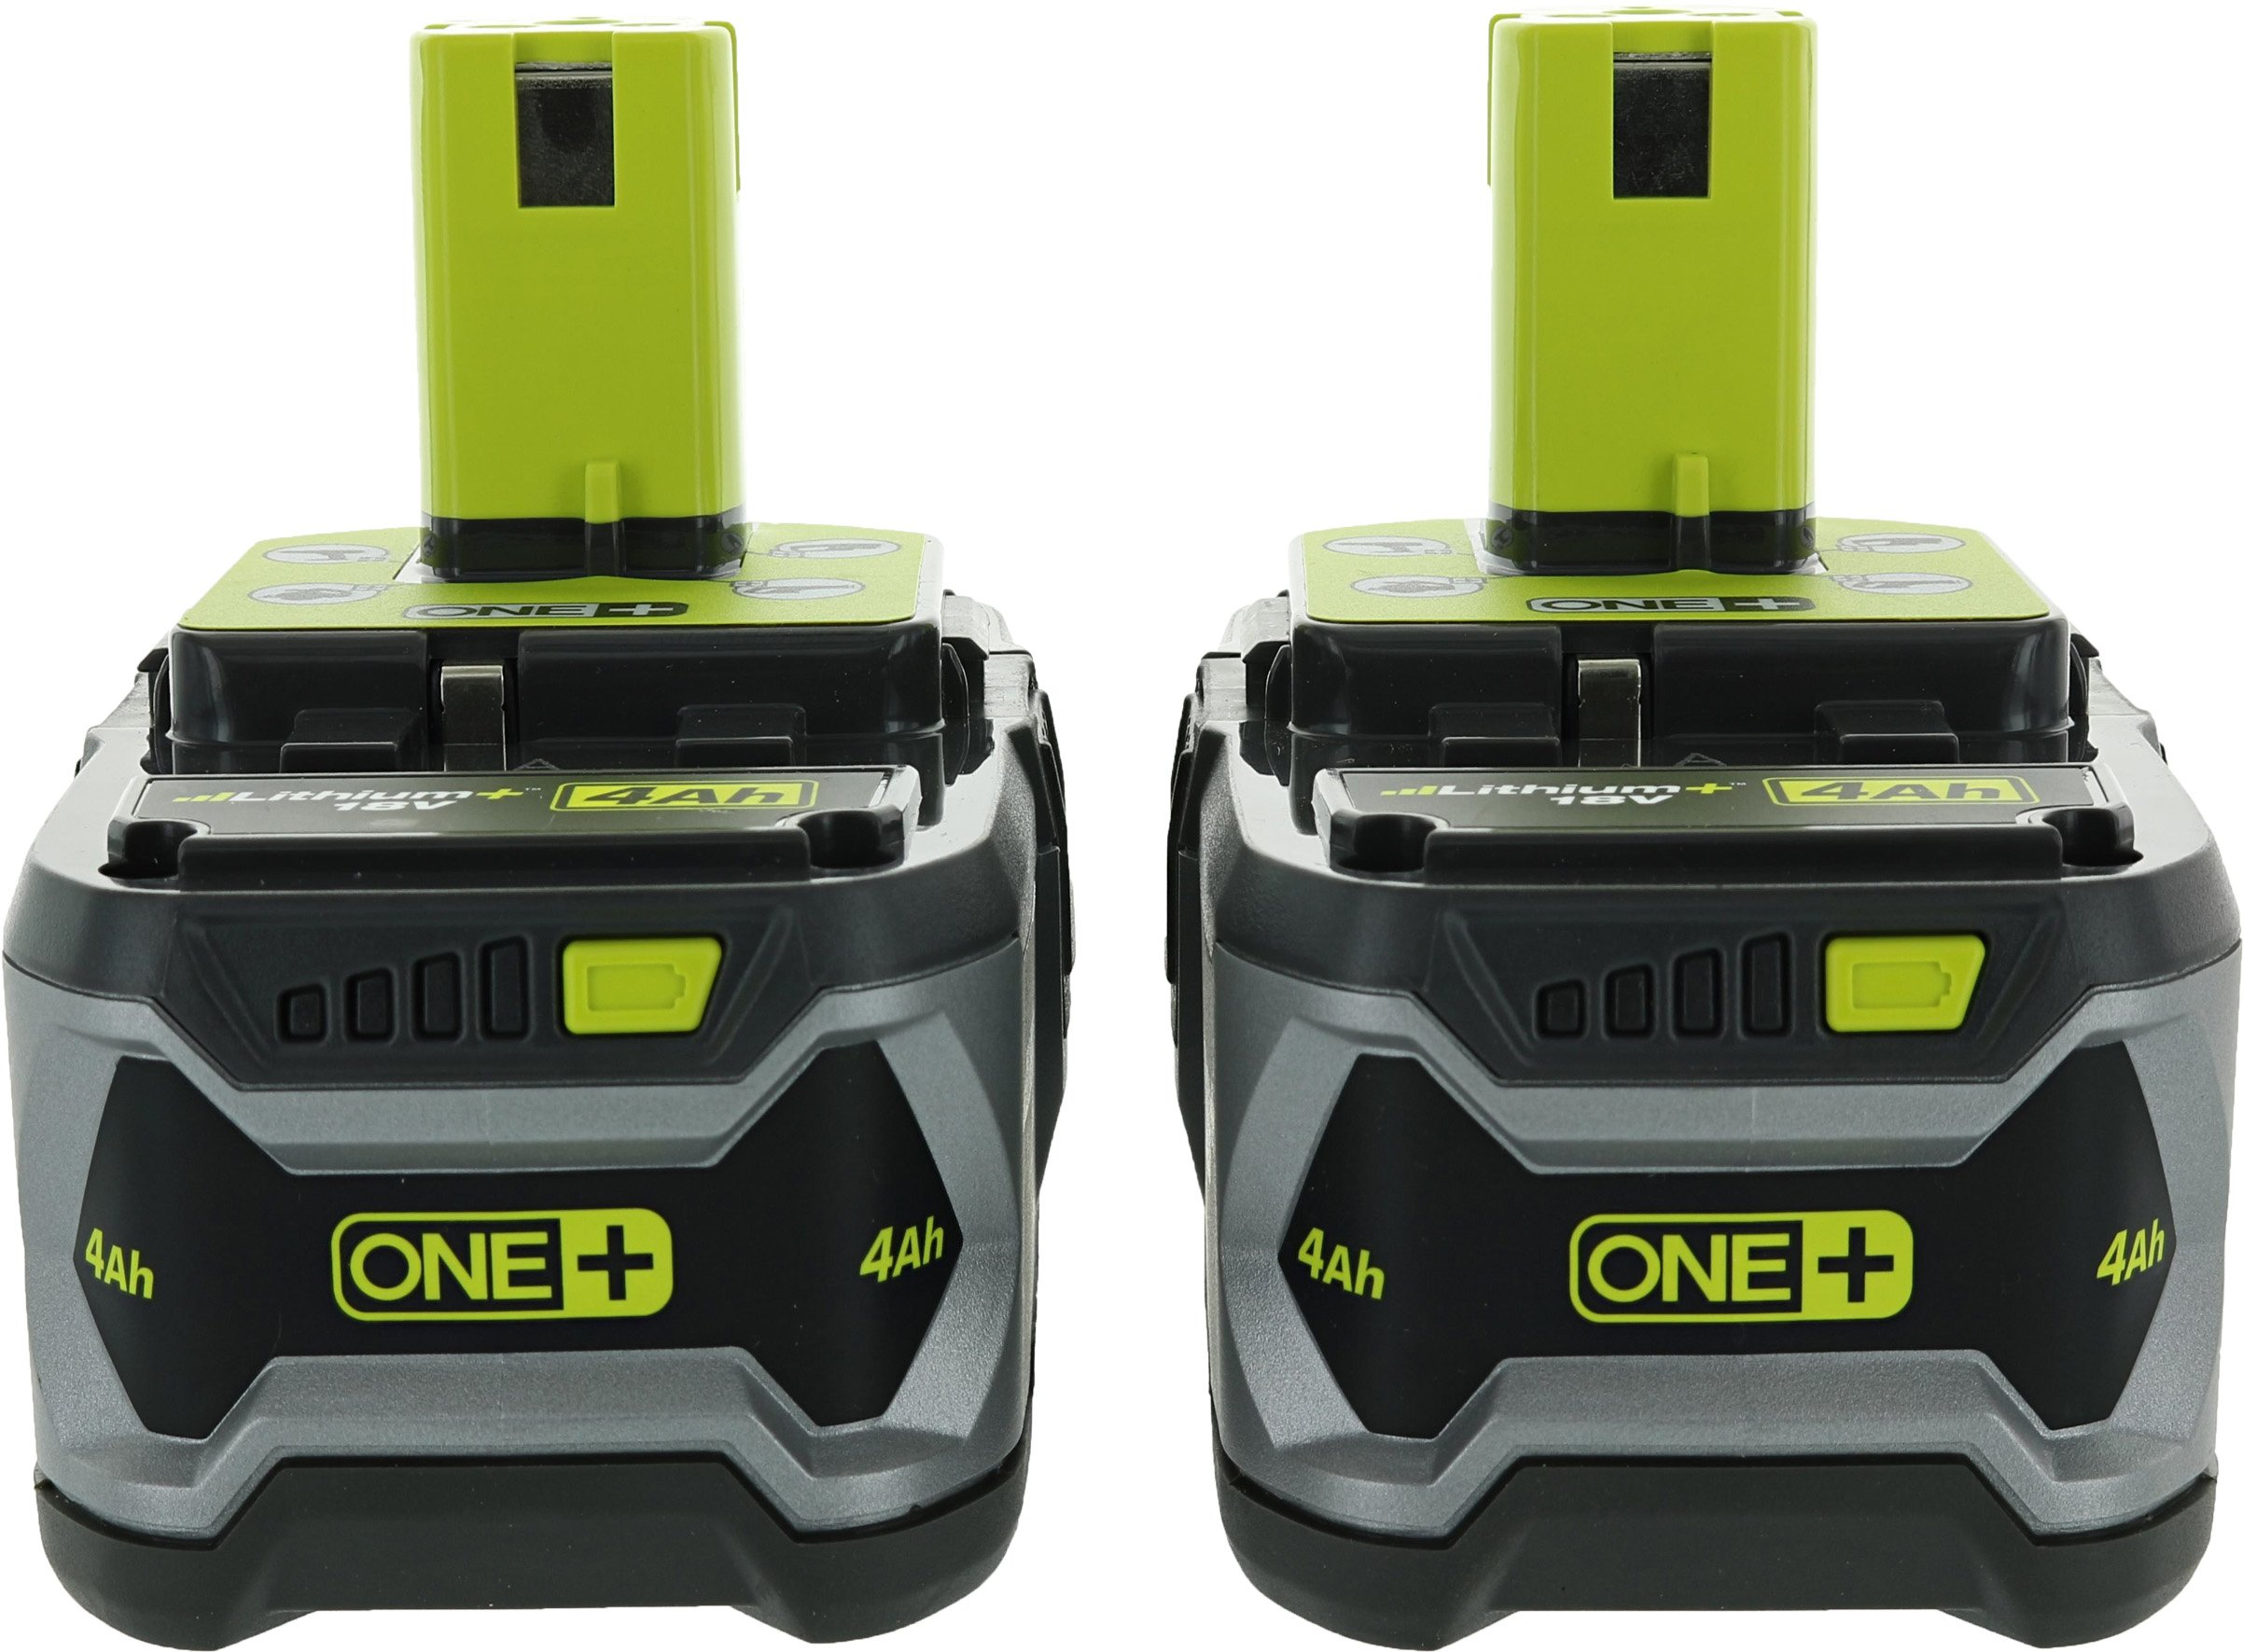 Ryobi P122 4AH One+ High Capacity Lithium Ion Batteries For Ryobi Power Tools (2 Pack of P108 Batteries) by Ryobi (Image #1)